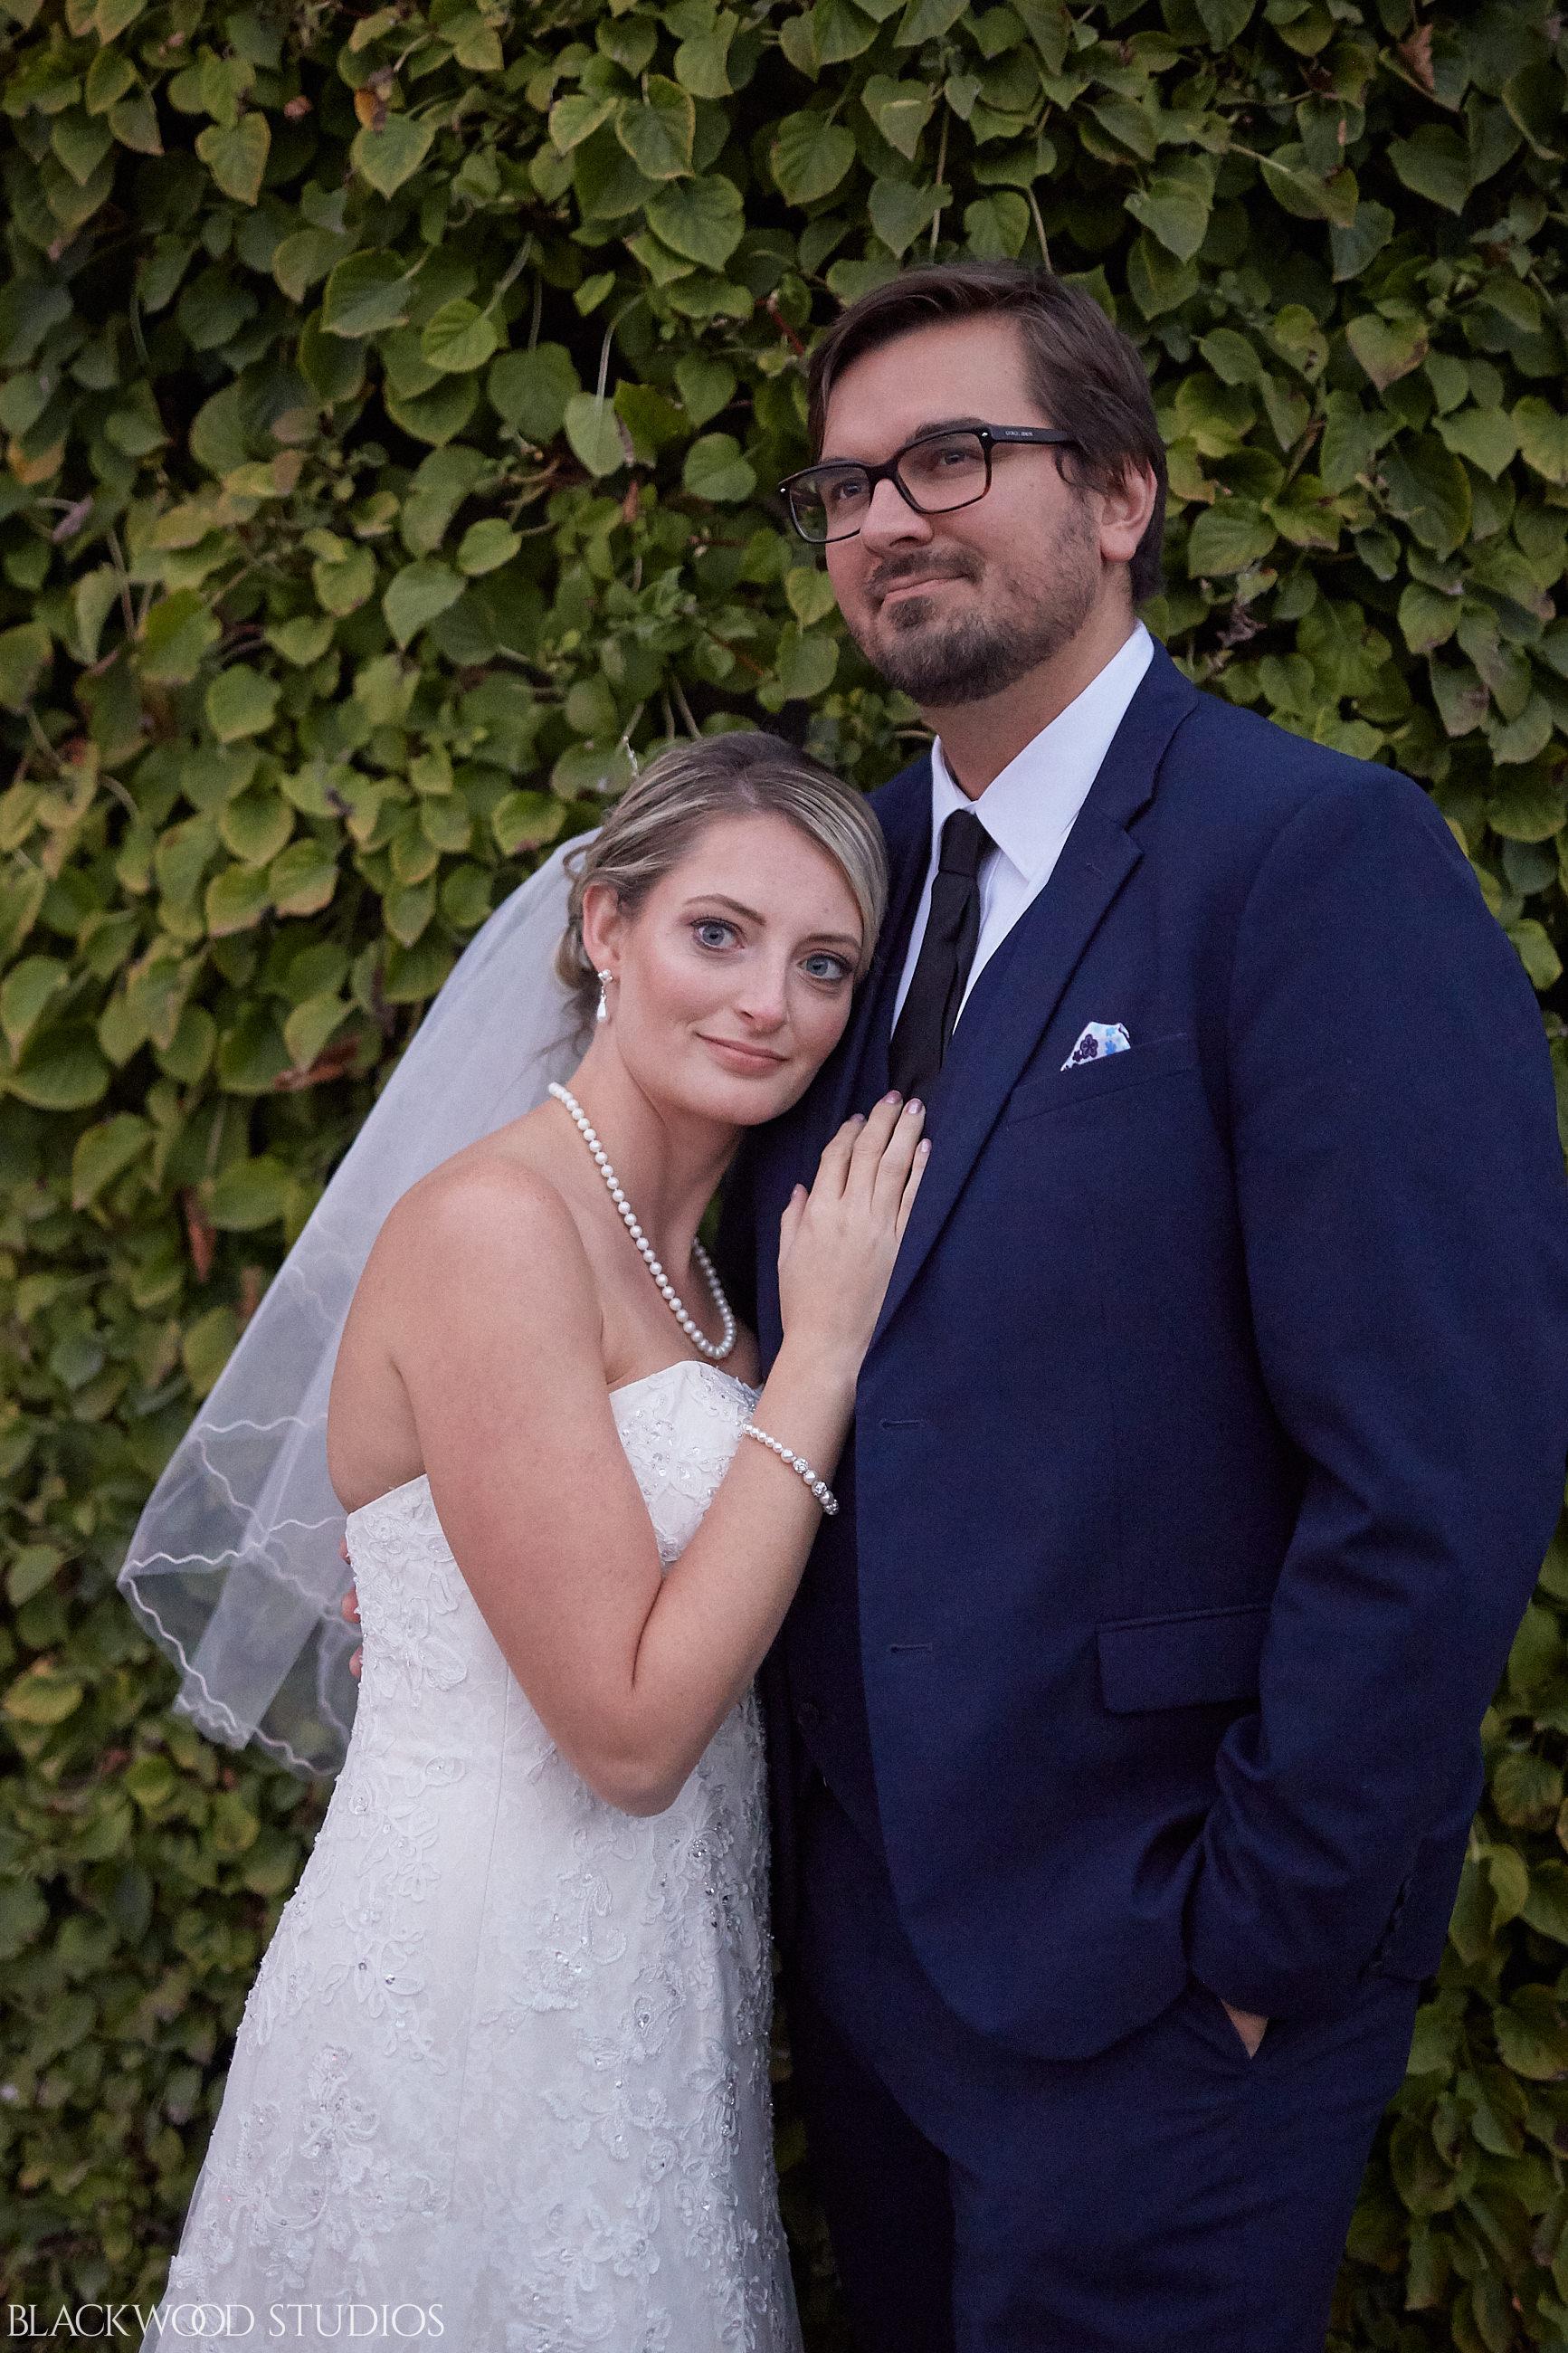 Blackwood-Studios-Wedding-Photography-20170928-190655-Marek-Katie-Michalek-Oakes-Garden-Theatre-Niagara-Falls-Ontario-Canada.jpg